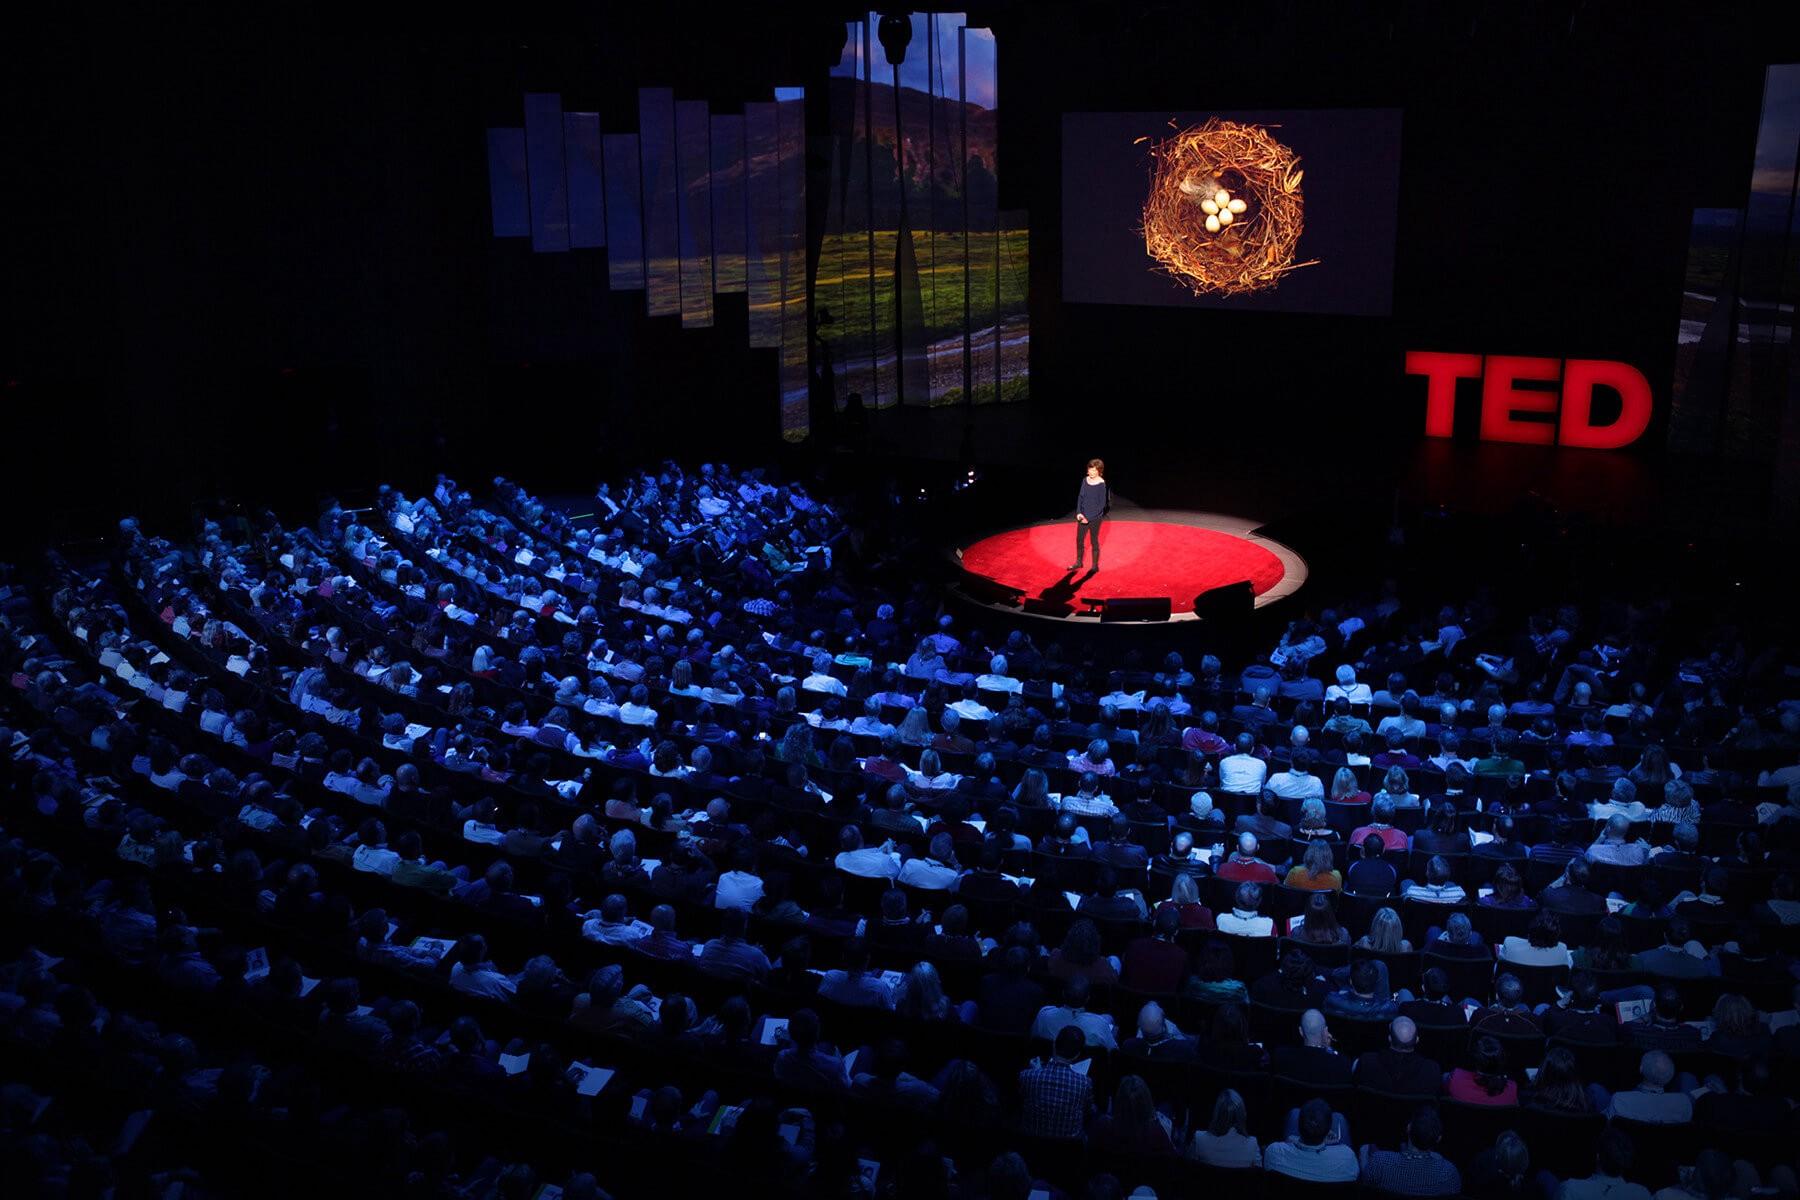 palco do Ted Talks